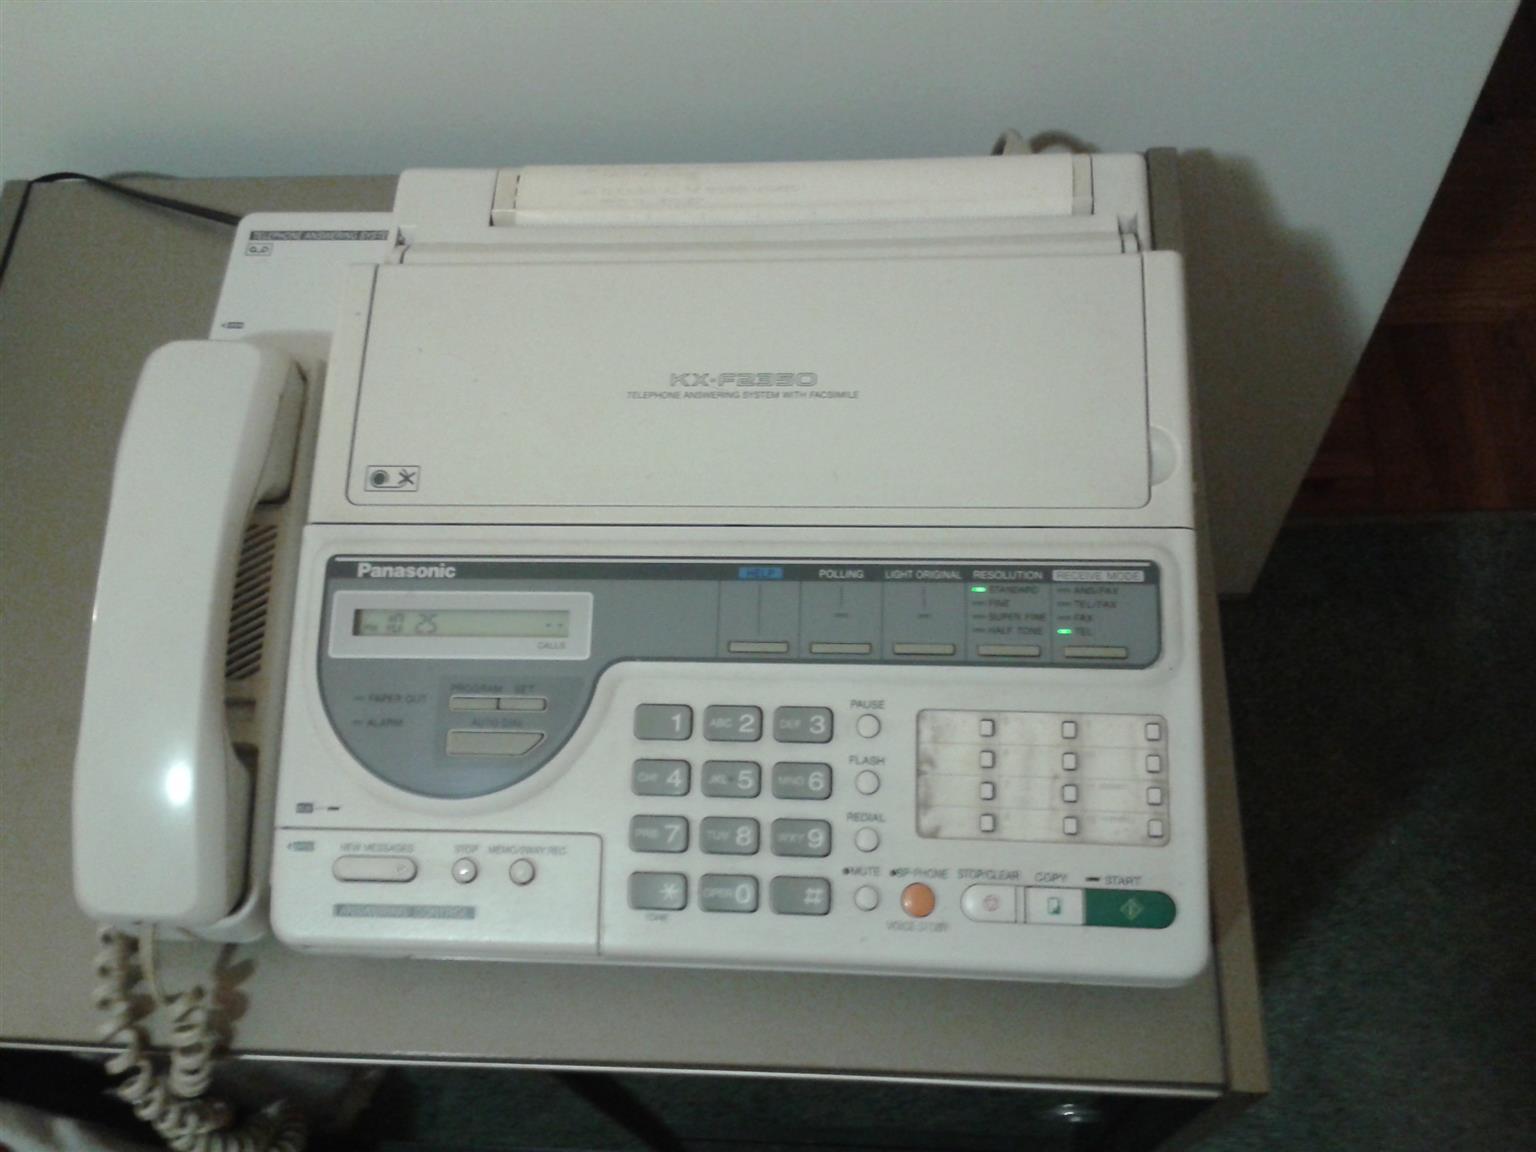 Telephone Answering System with Facsimile, Panasonic